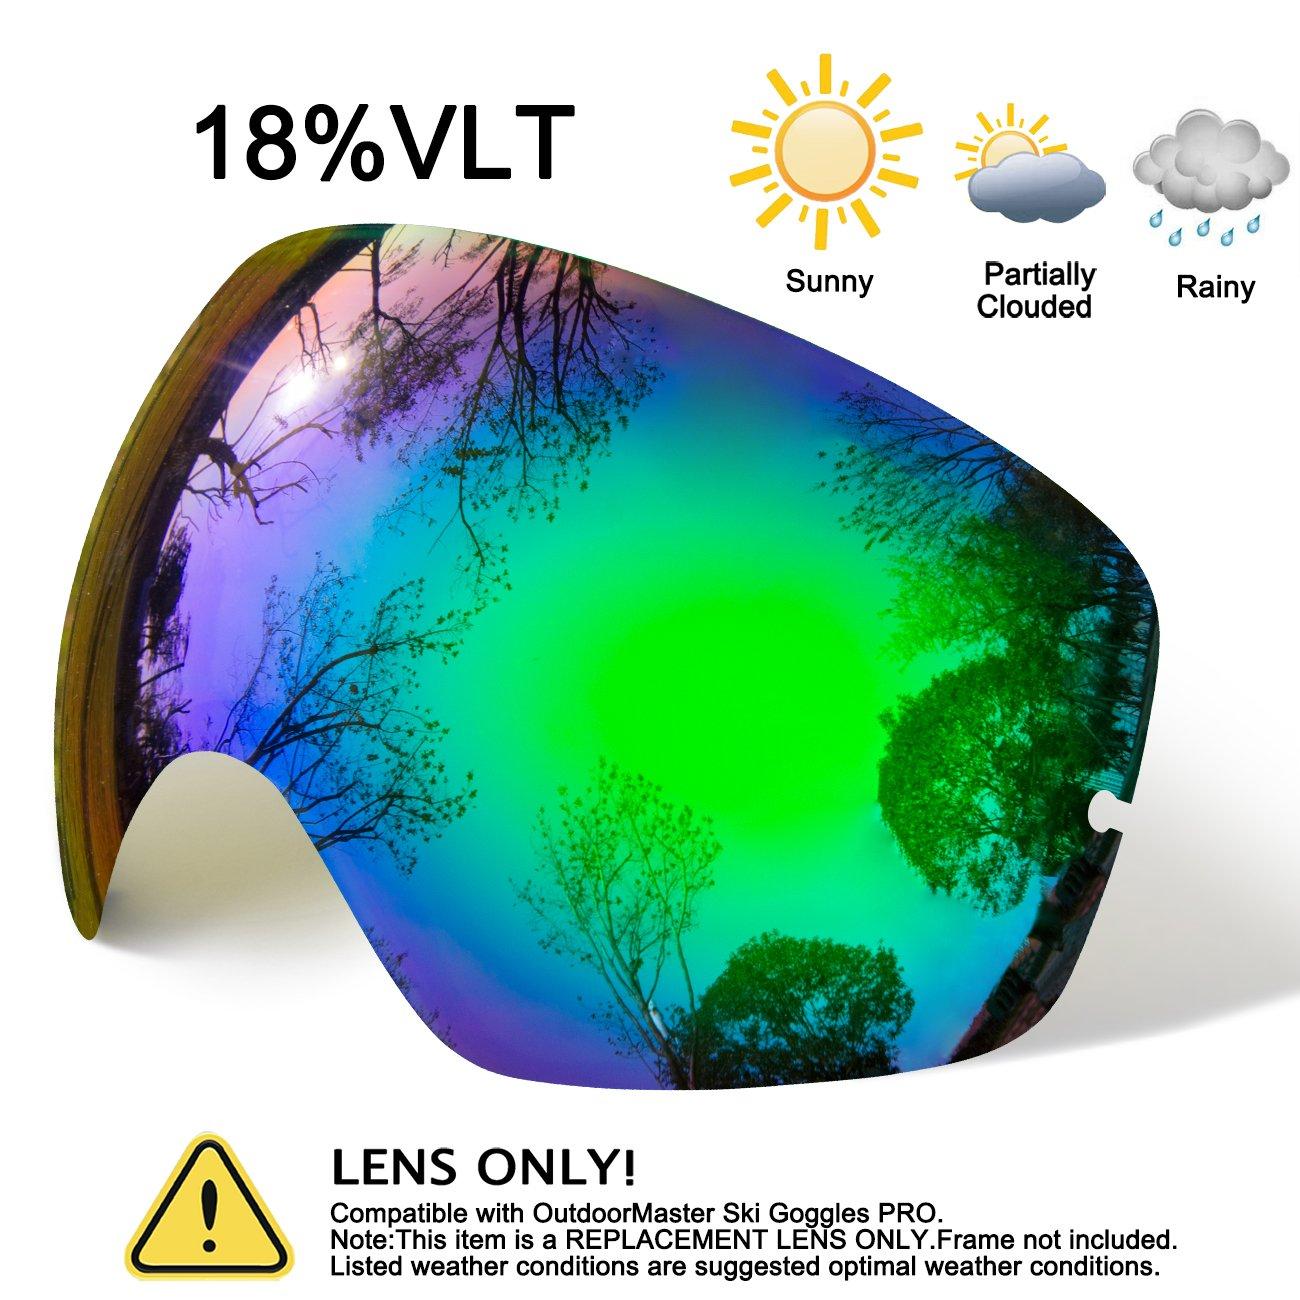 hongdak Ski Goggles Lens, Snowboard Goggles UV Protection, Snow Goggles Helmet Compatible men women boys girls kids, Anti fog OTG Green Lens by hongdak